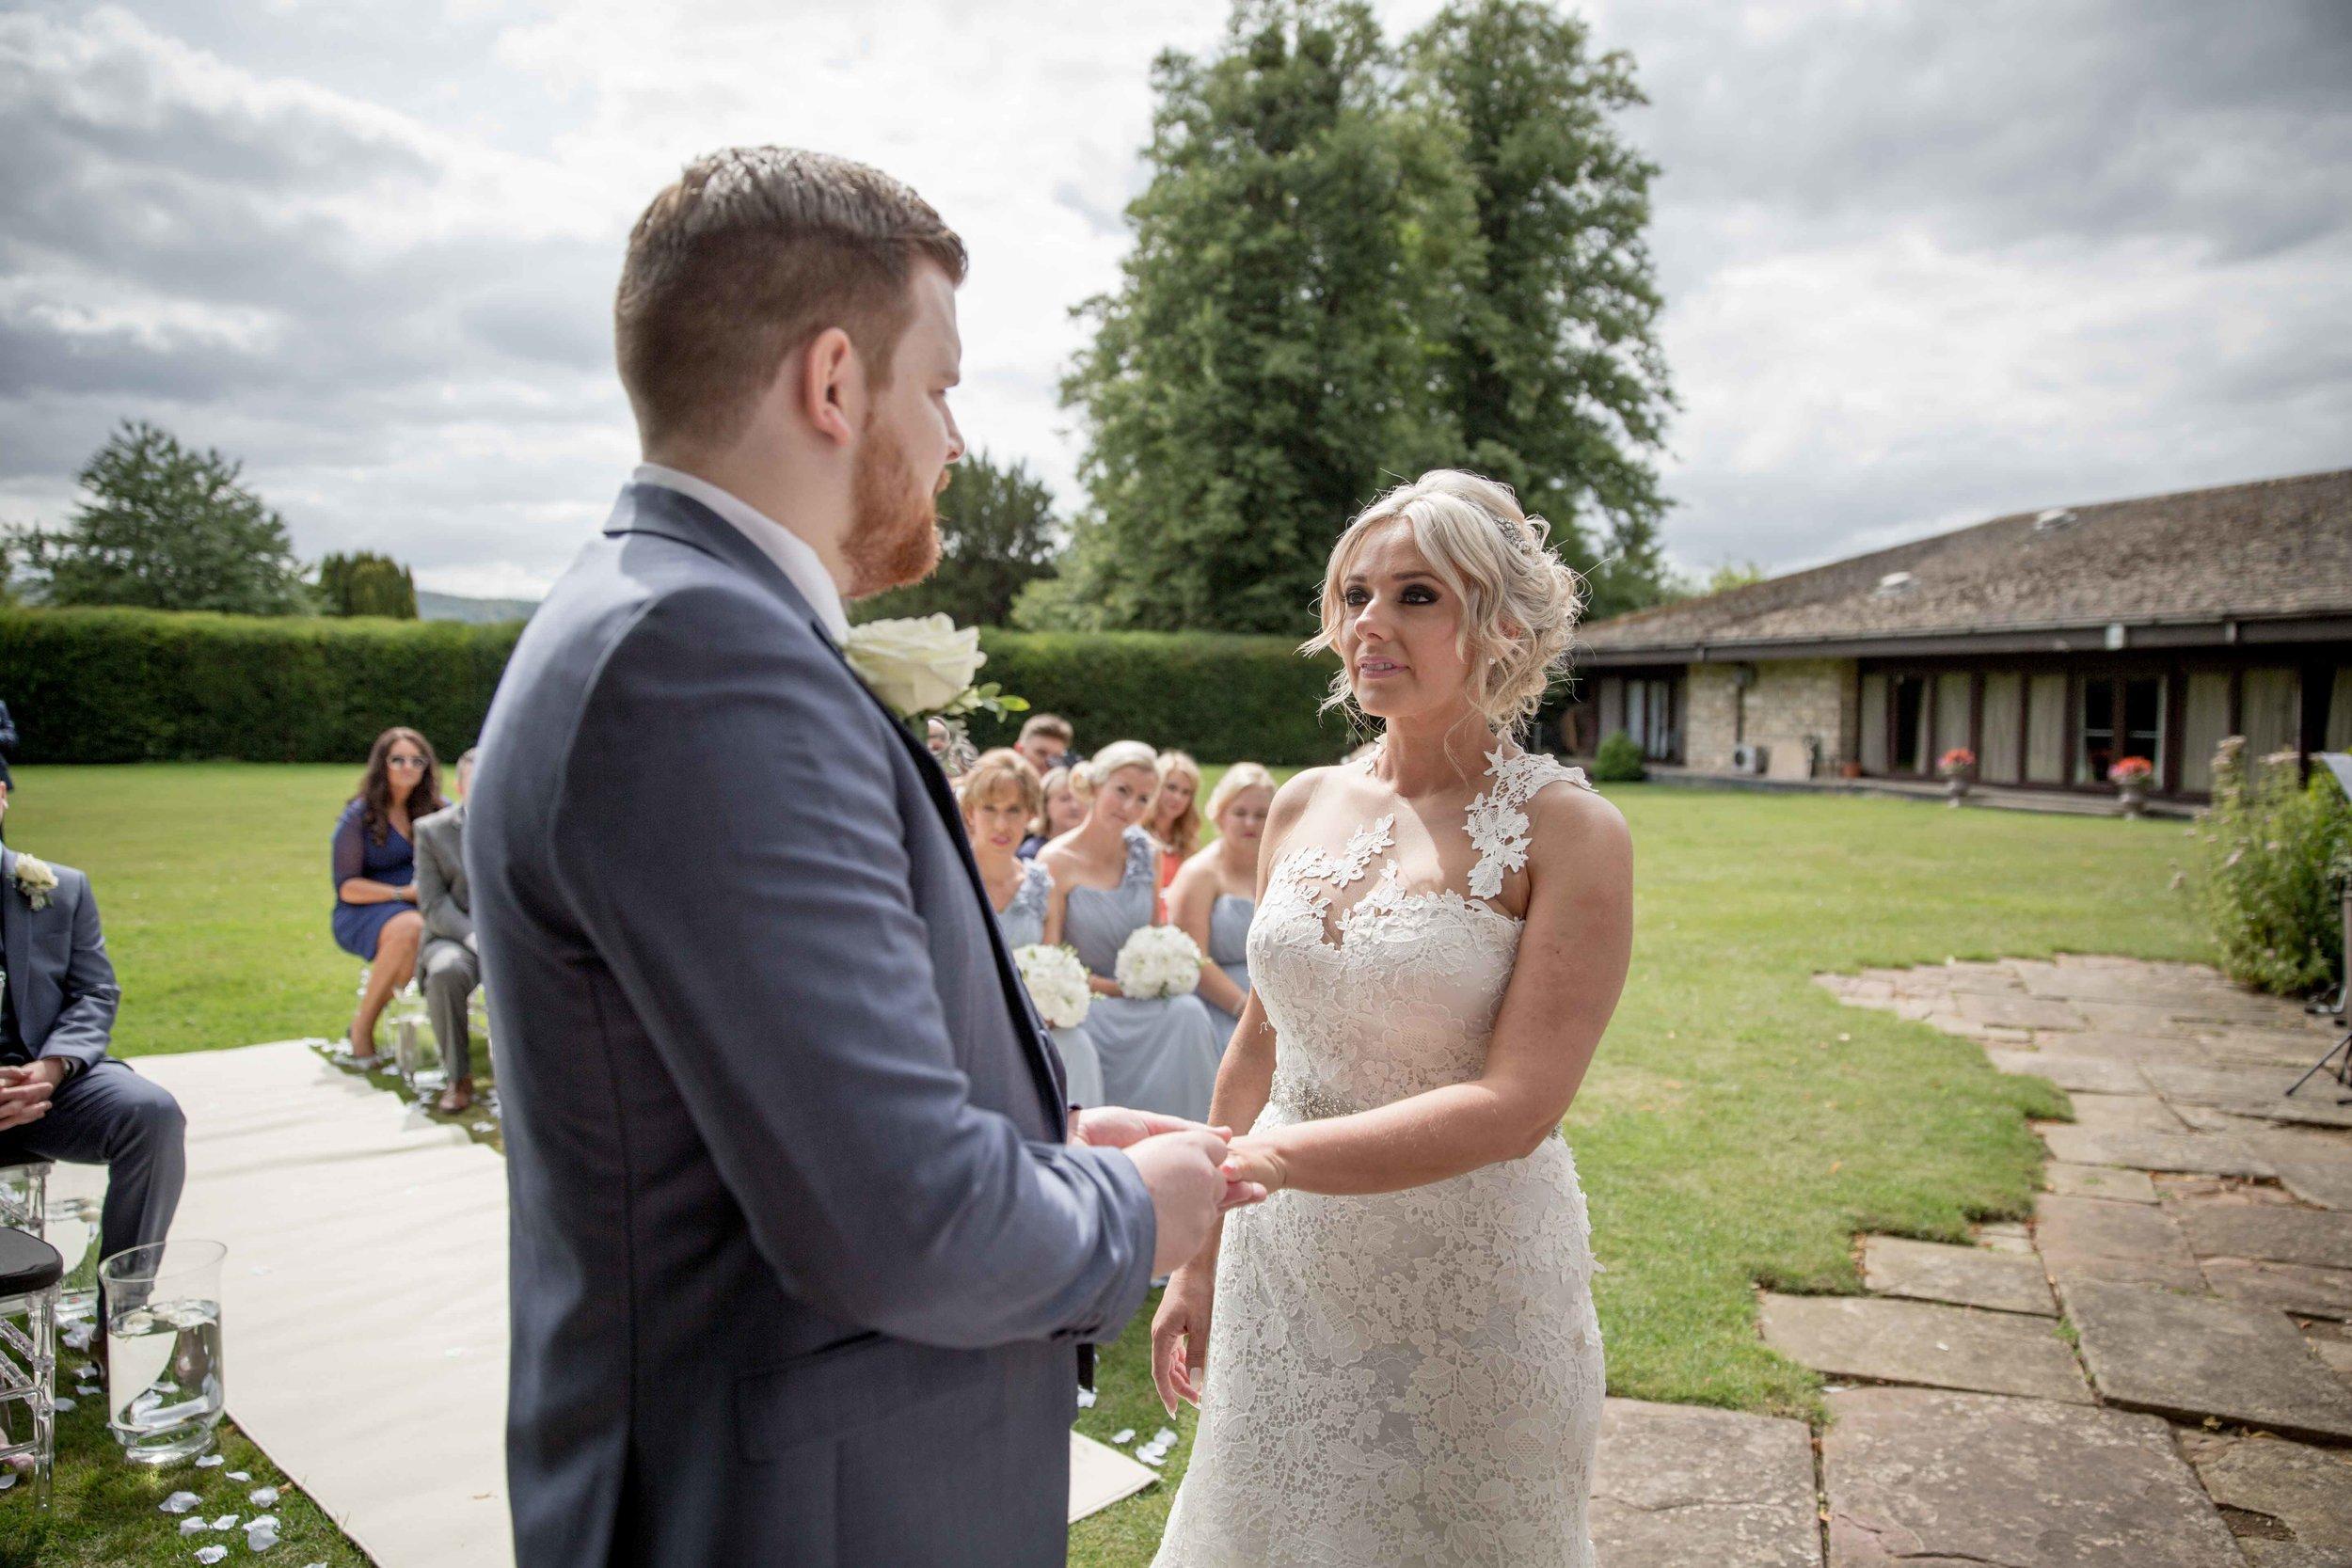 cotswold-wedding-photography-at-stonehouse-court-hotel-natalia-smith-photography-gloucestershire-wedding-photographer-22.jpg